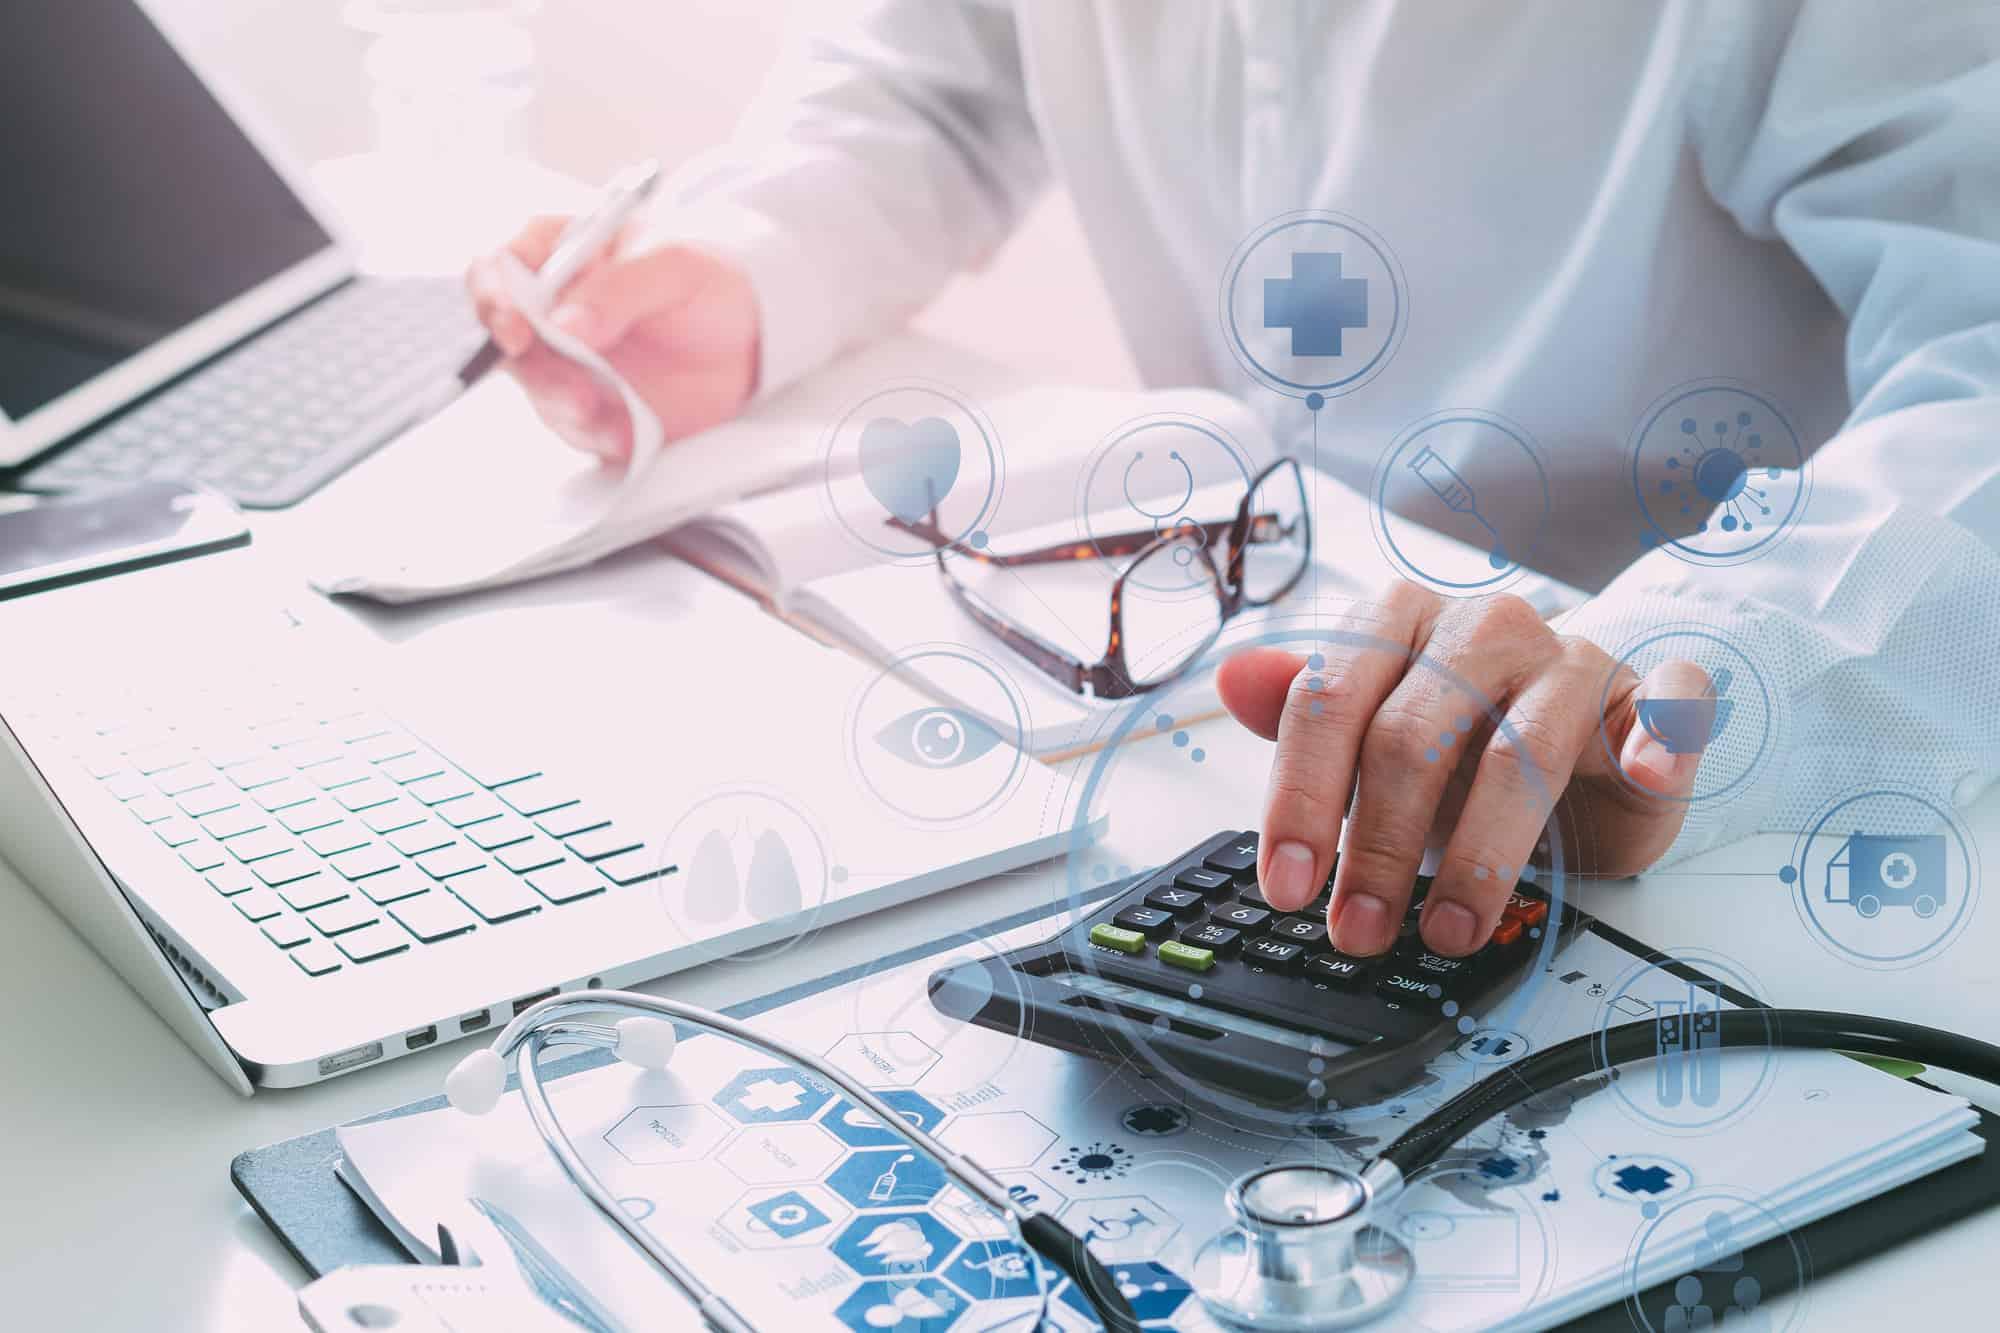 Rising Positivity in Healthcare Investment in Dubai